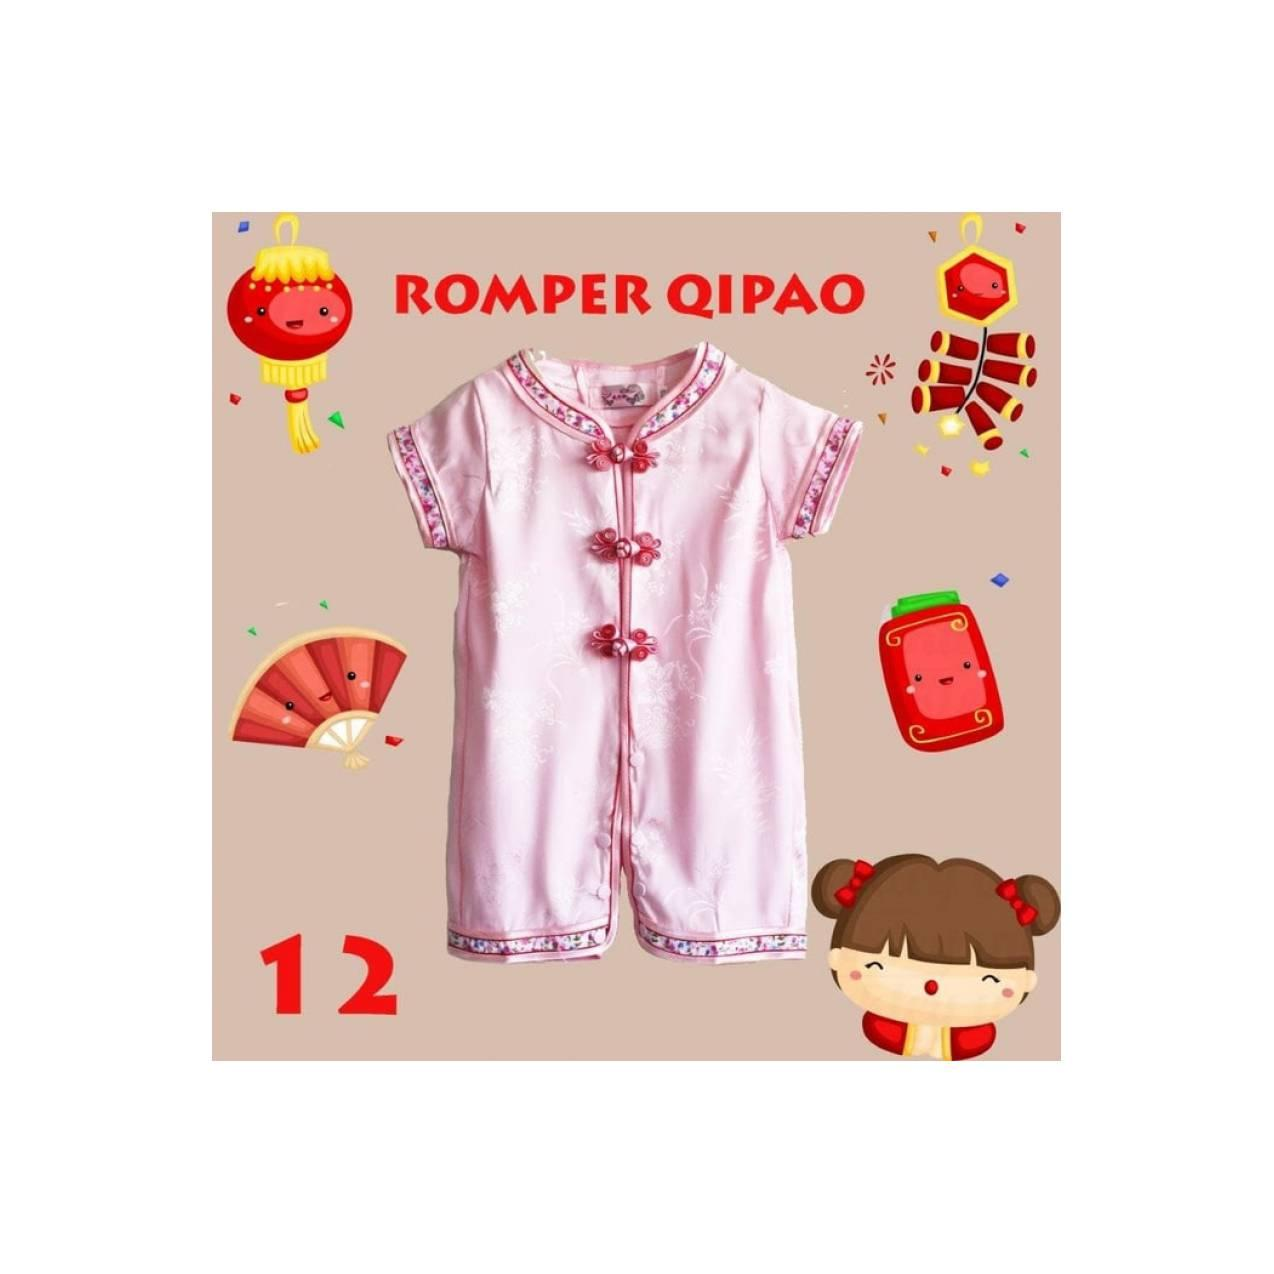 romper baju imlek cheongsam anak bayi cewe perempuan pink bunga sakura